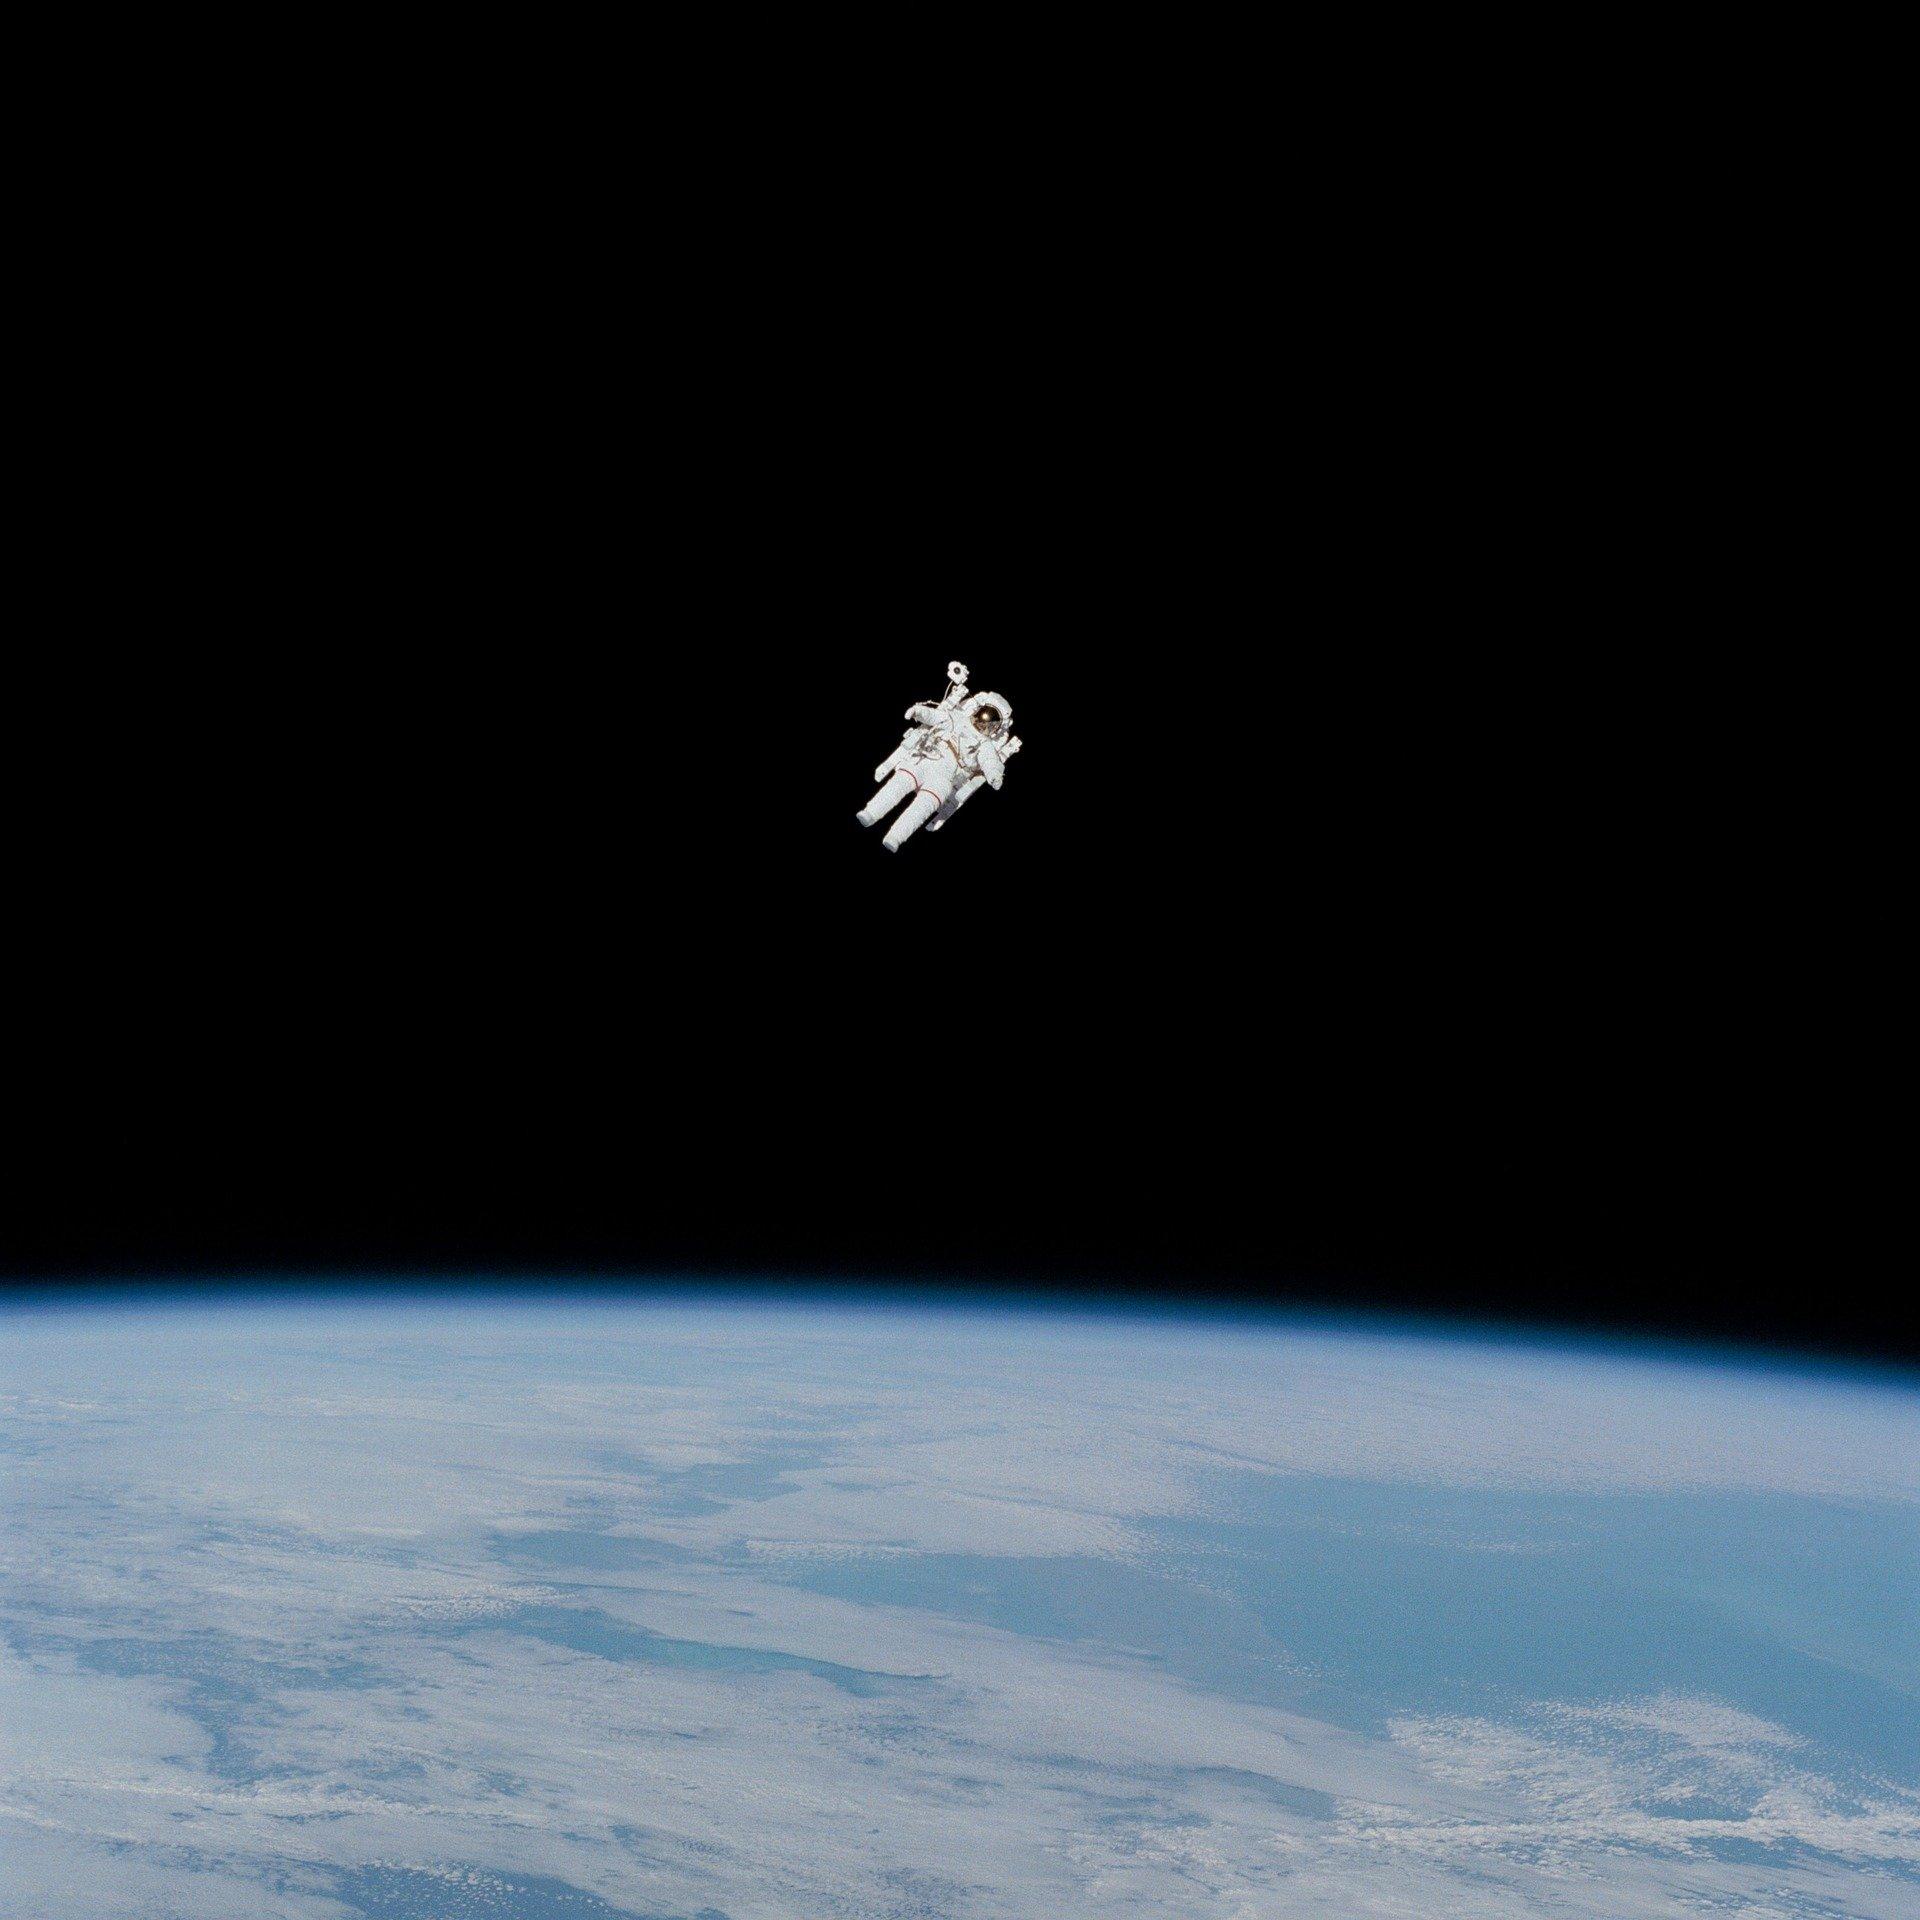 astronaut-gb69be42c2_1920